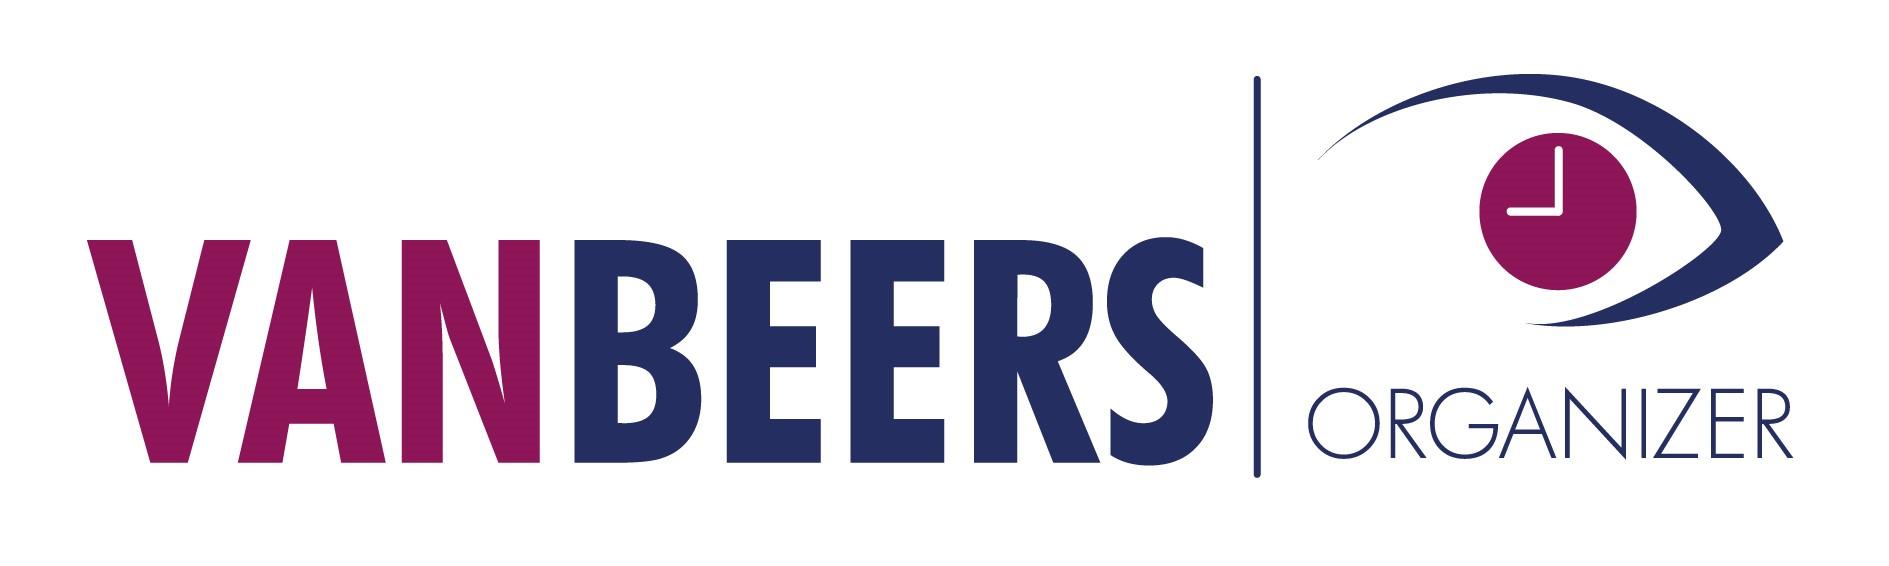 van Beers Professional Organizer Logo